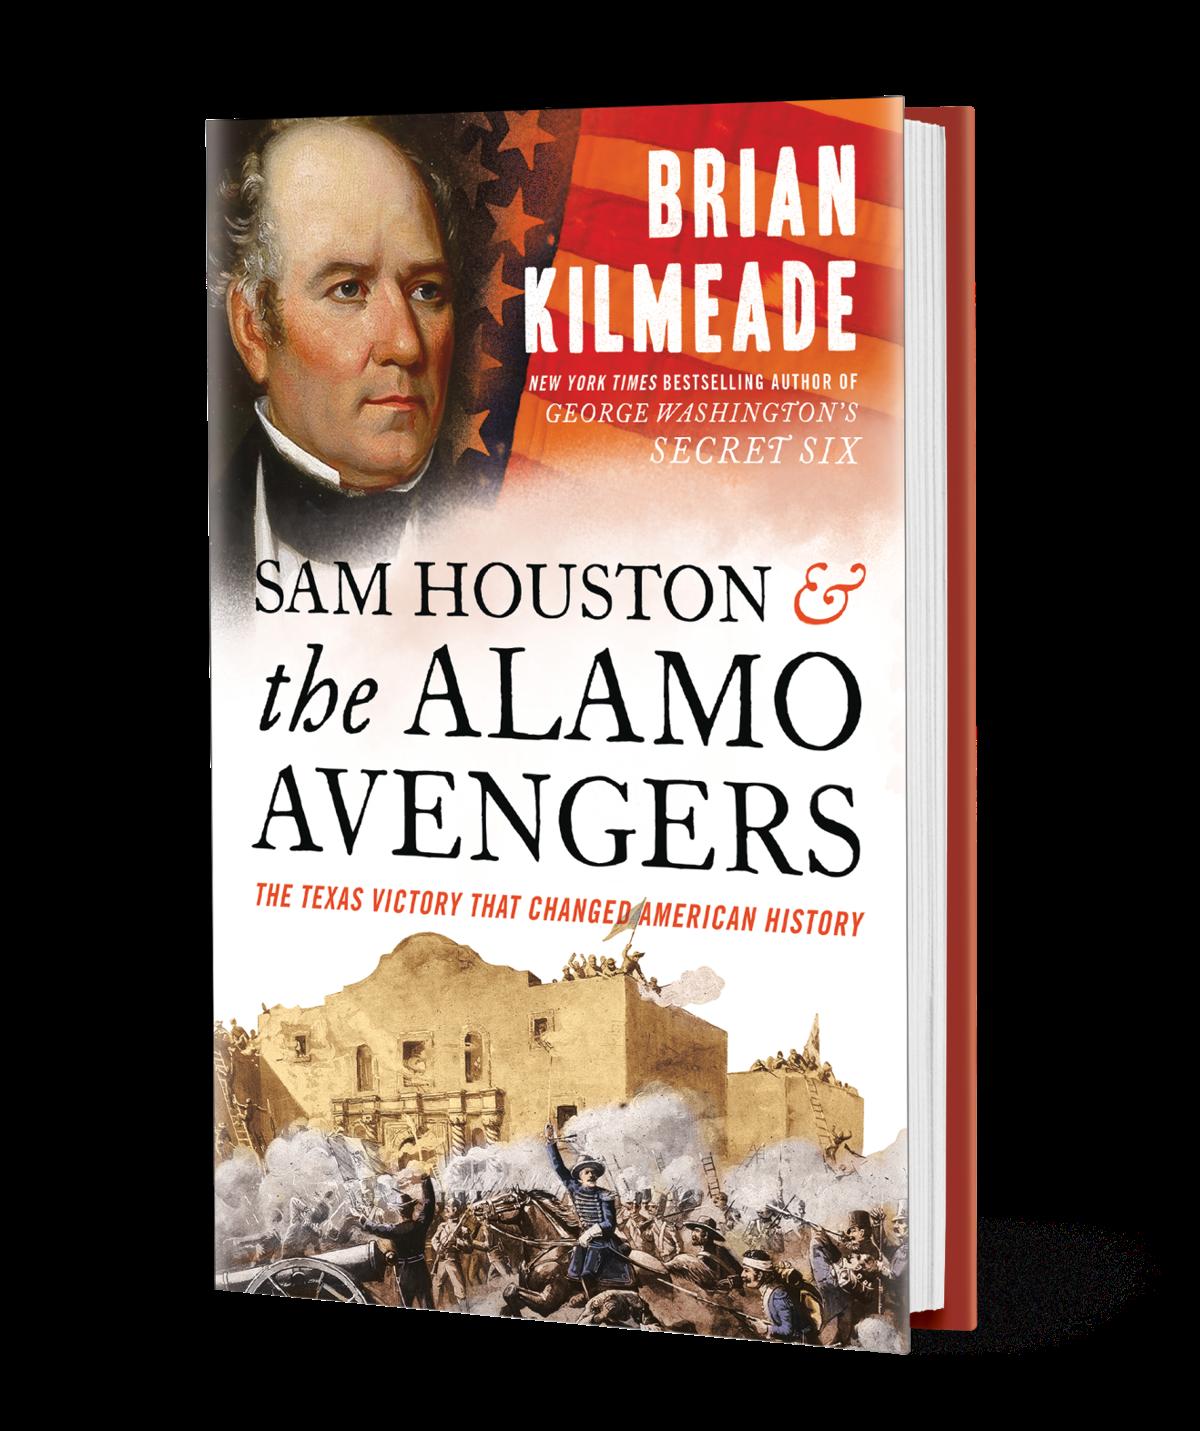 Sam Houston & the Alamo Avengers (3D version)